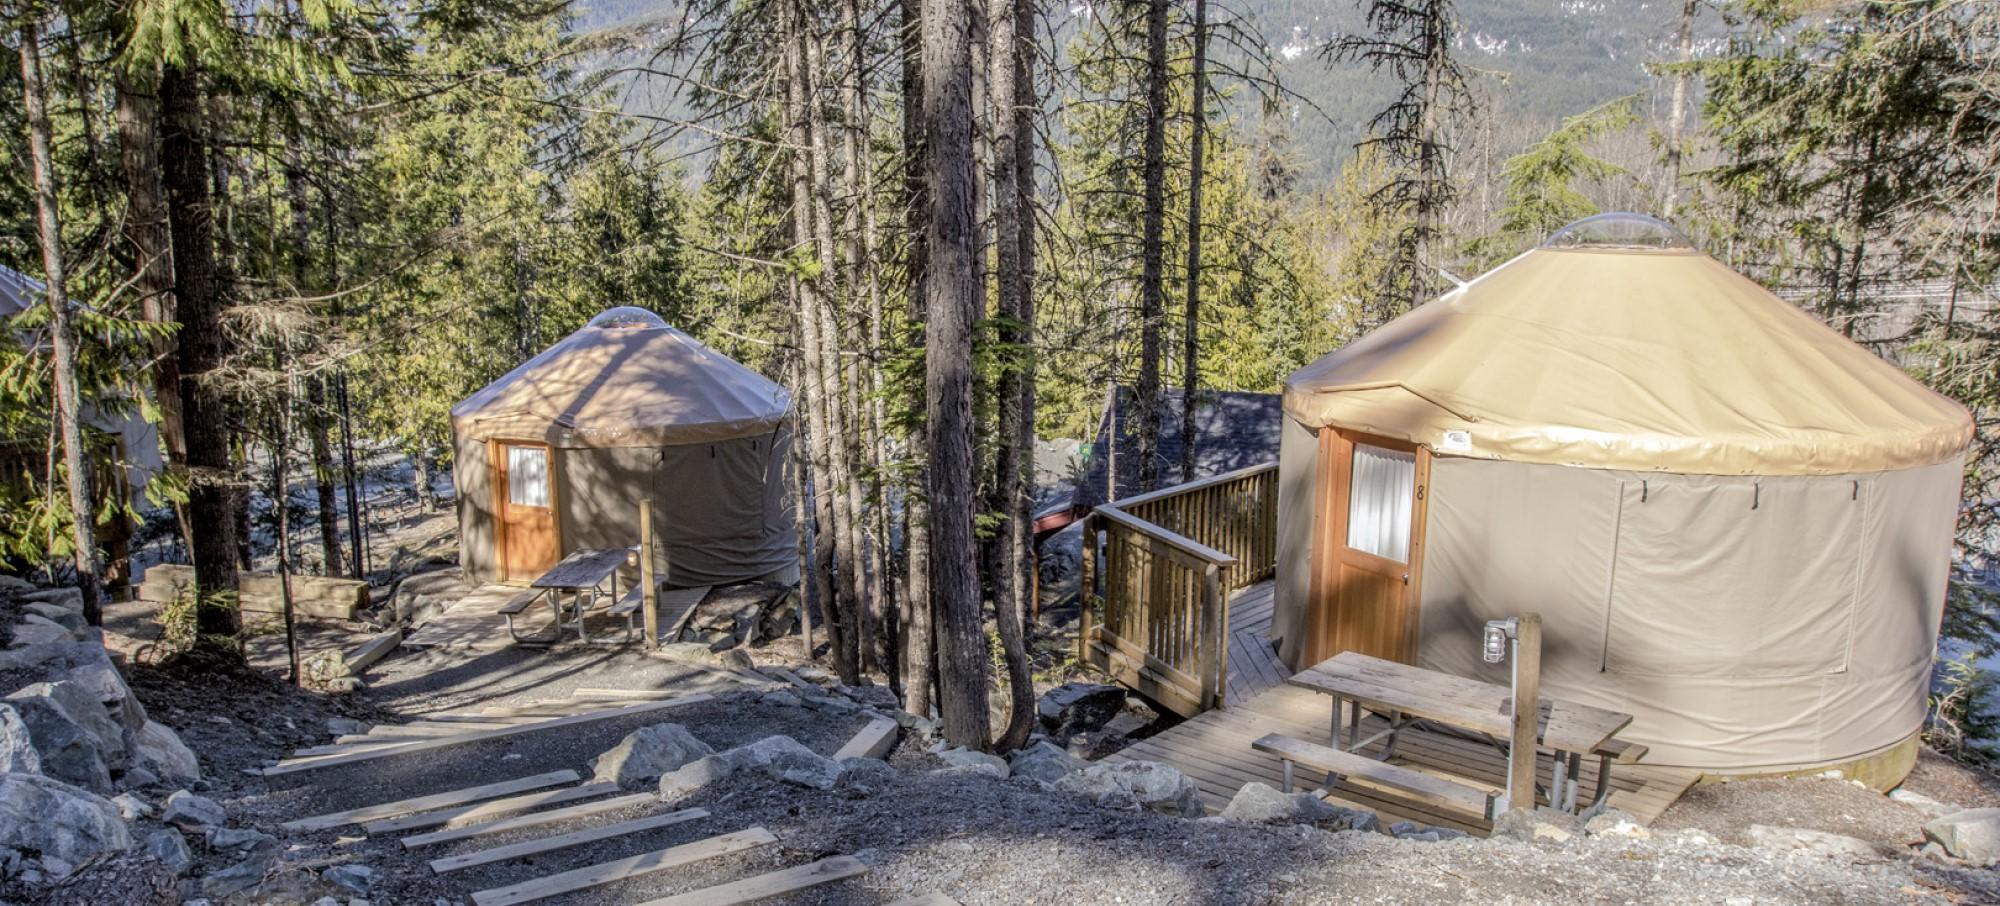 Get Away to Whistler, British Columbia This Summer